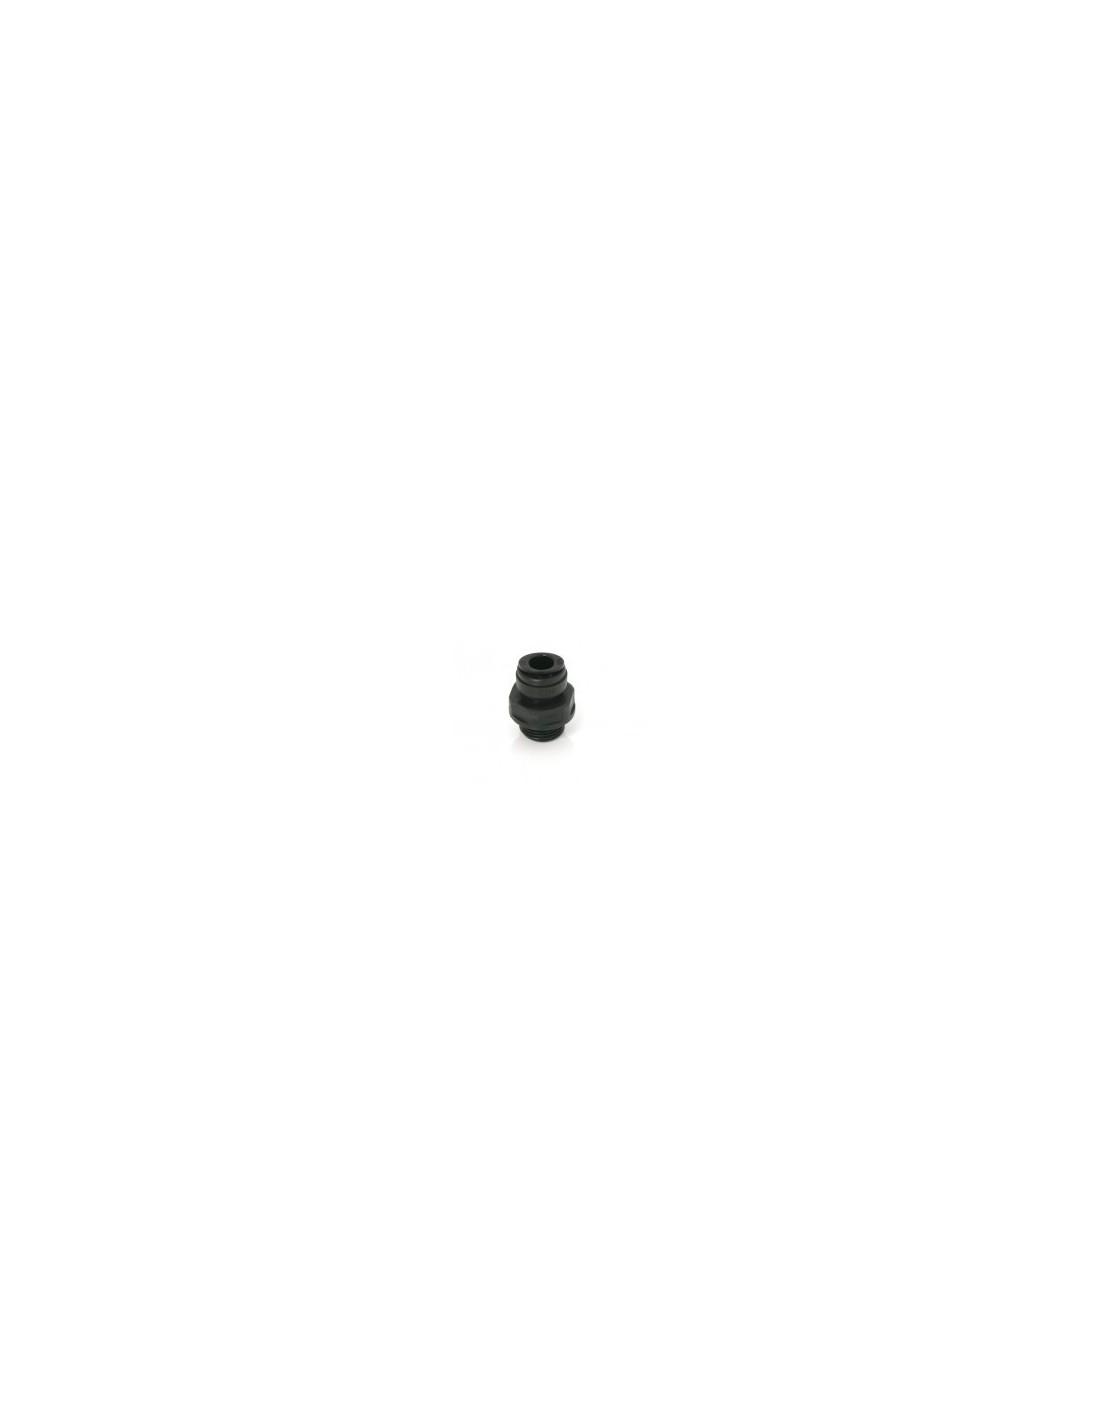 "SPO02230 - DM 1/2"" x 9,5 mm (1/2"" x 3/8"")"